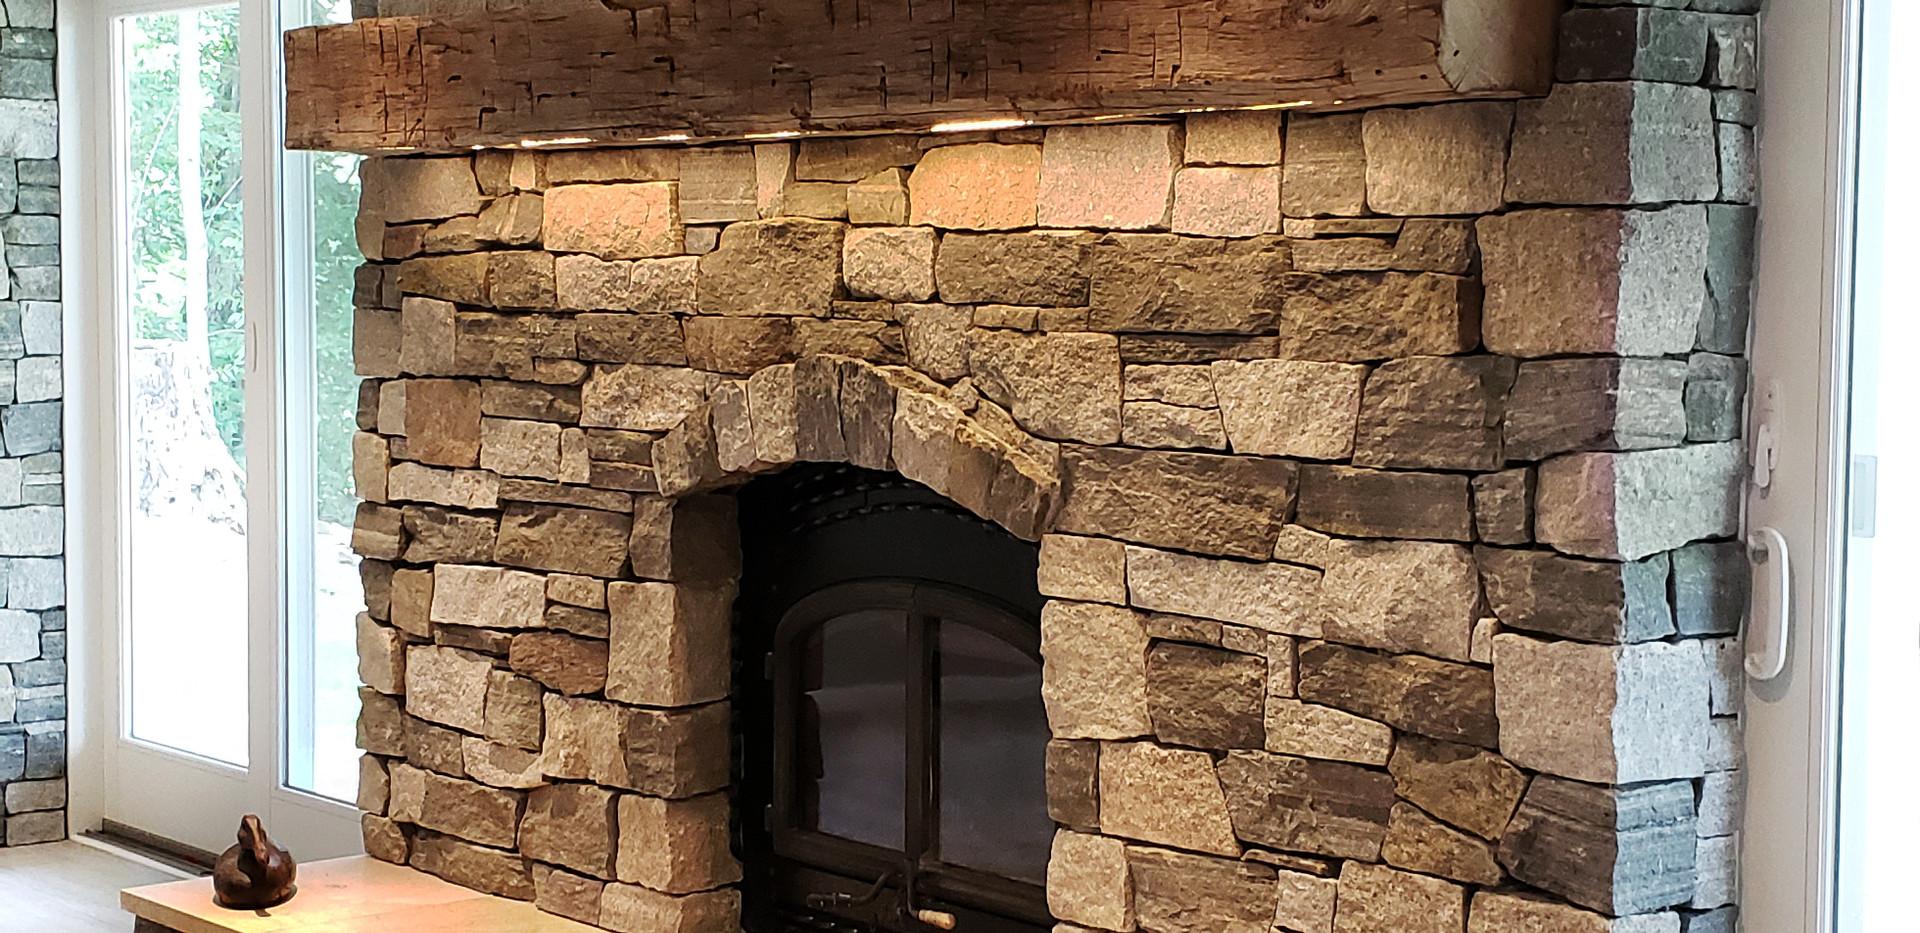 50% Bristol Ledge Stone 50% Misquite Ledge Stone